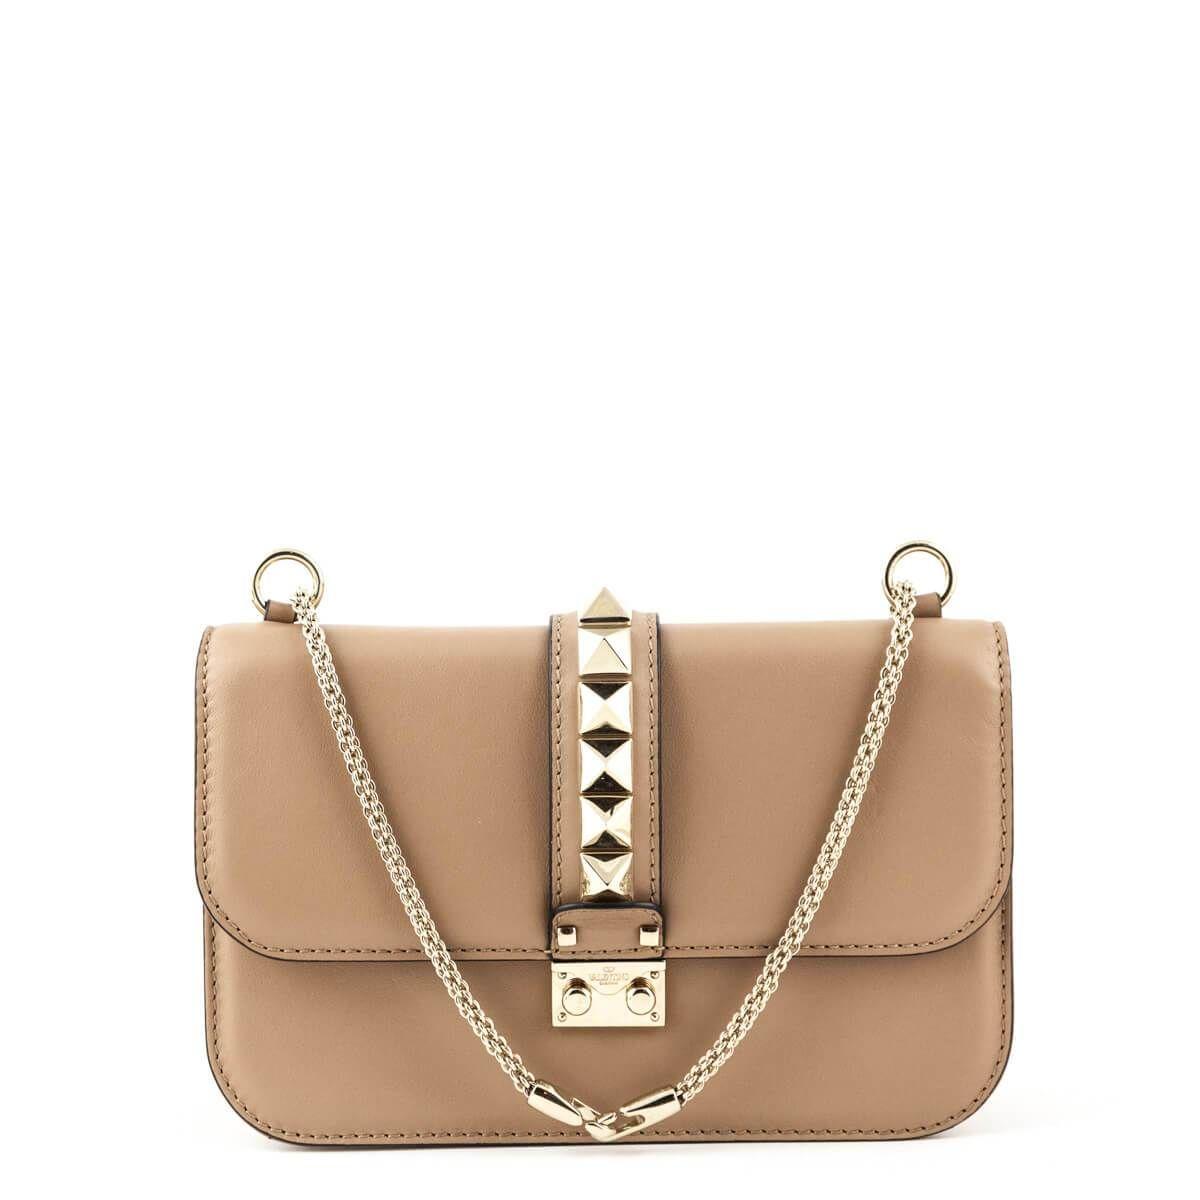 Valentino Beige Calfskin Medium Glamlock Chain Bag Designer Bags Chain Bags Bags Valentino